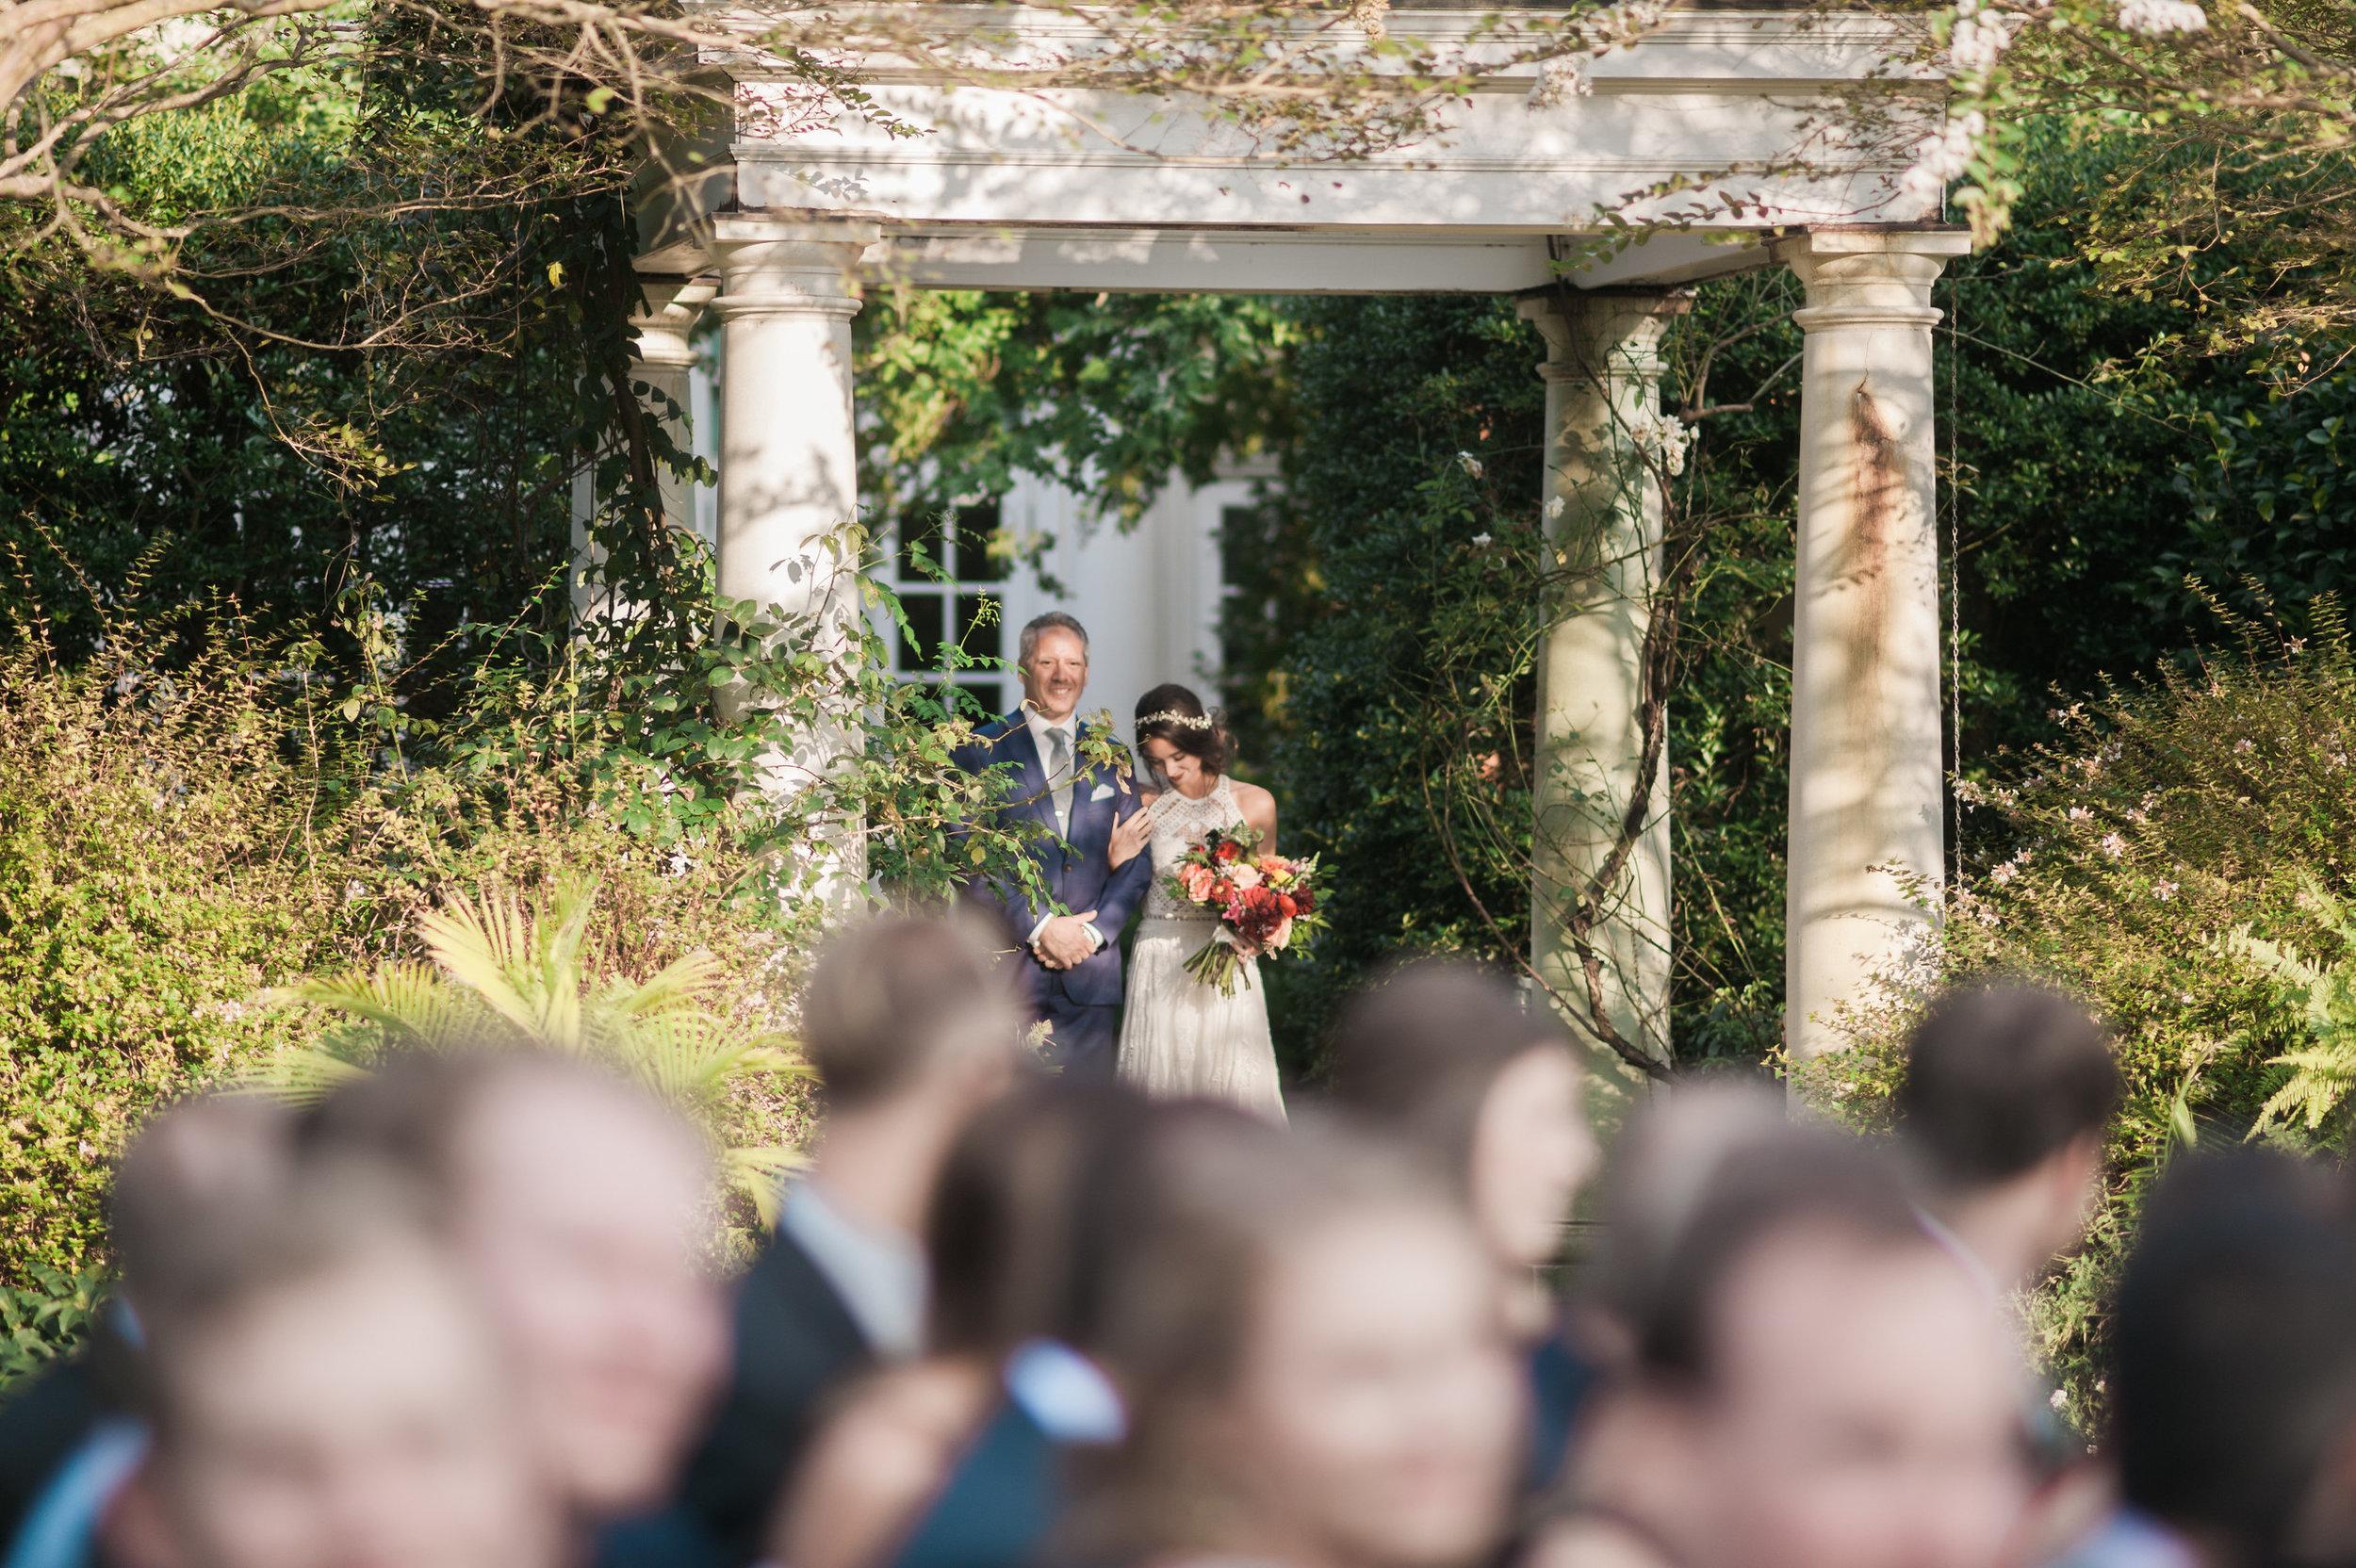 thomas-wedding-138-X5.jpg